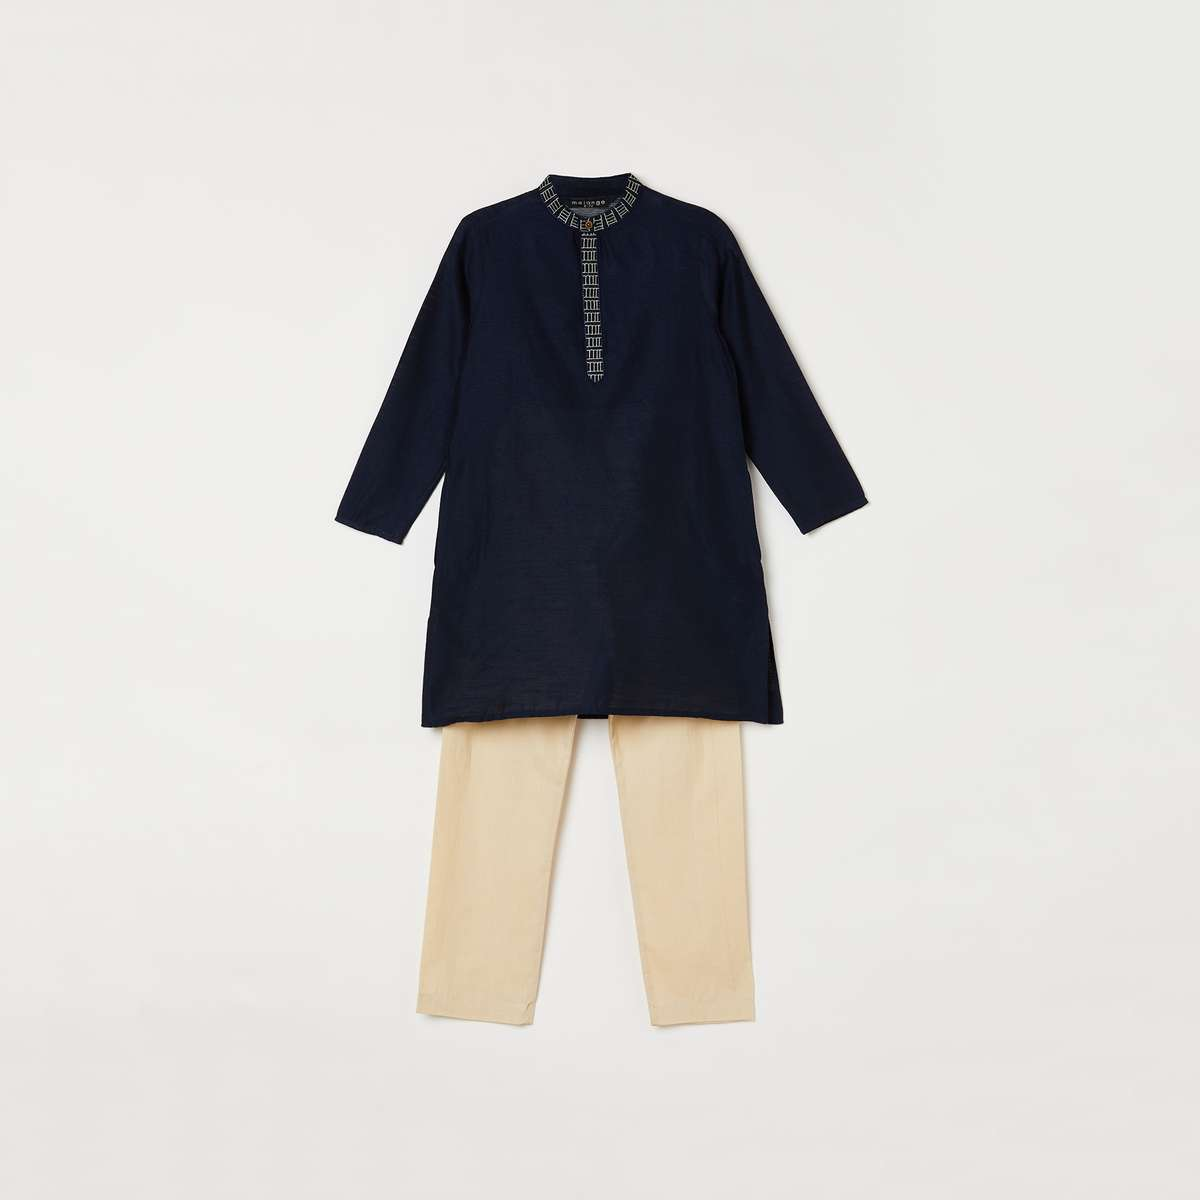 6.MELANGE Boys Solid Kurta with Solid Pyjama